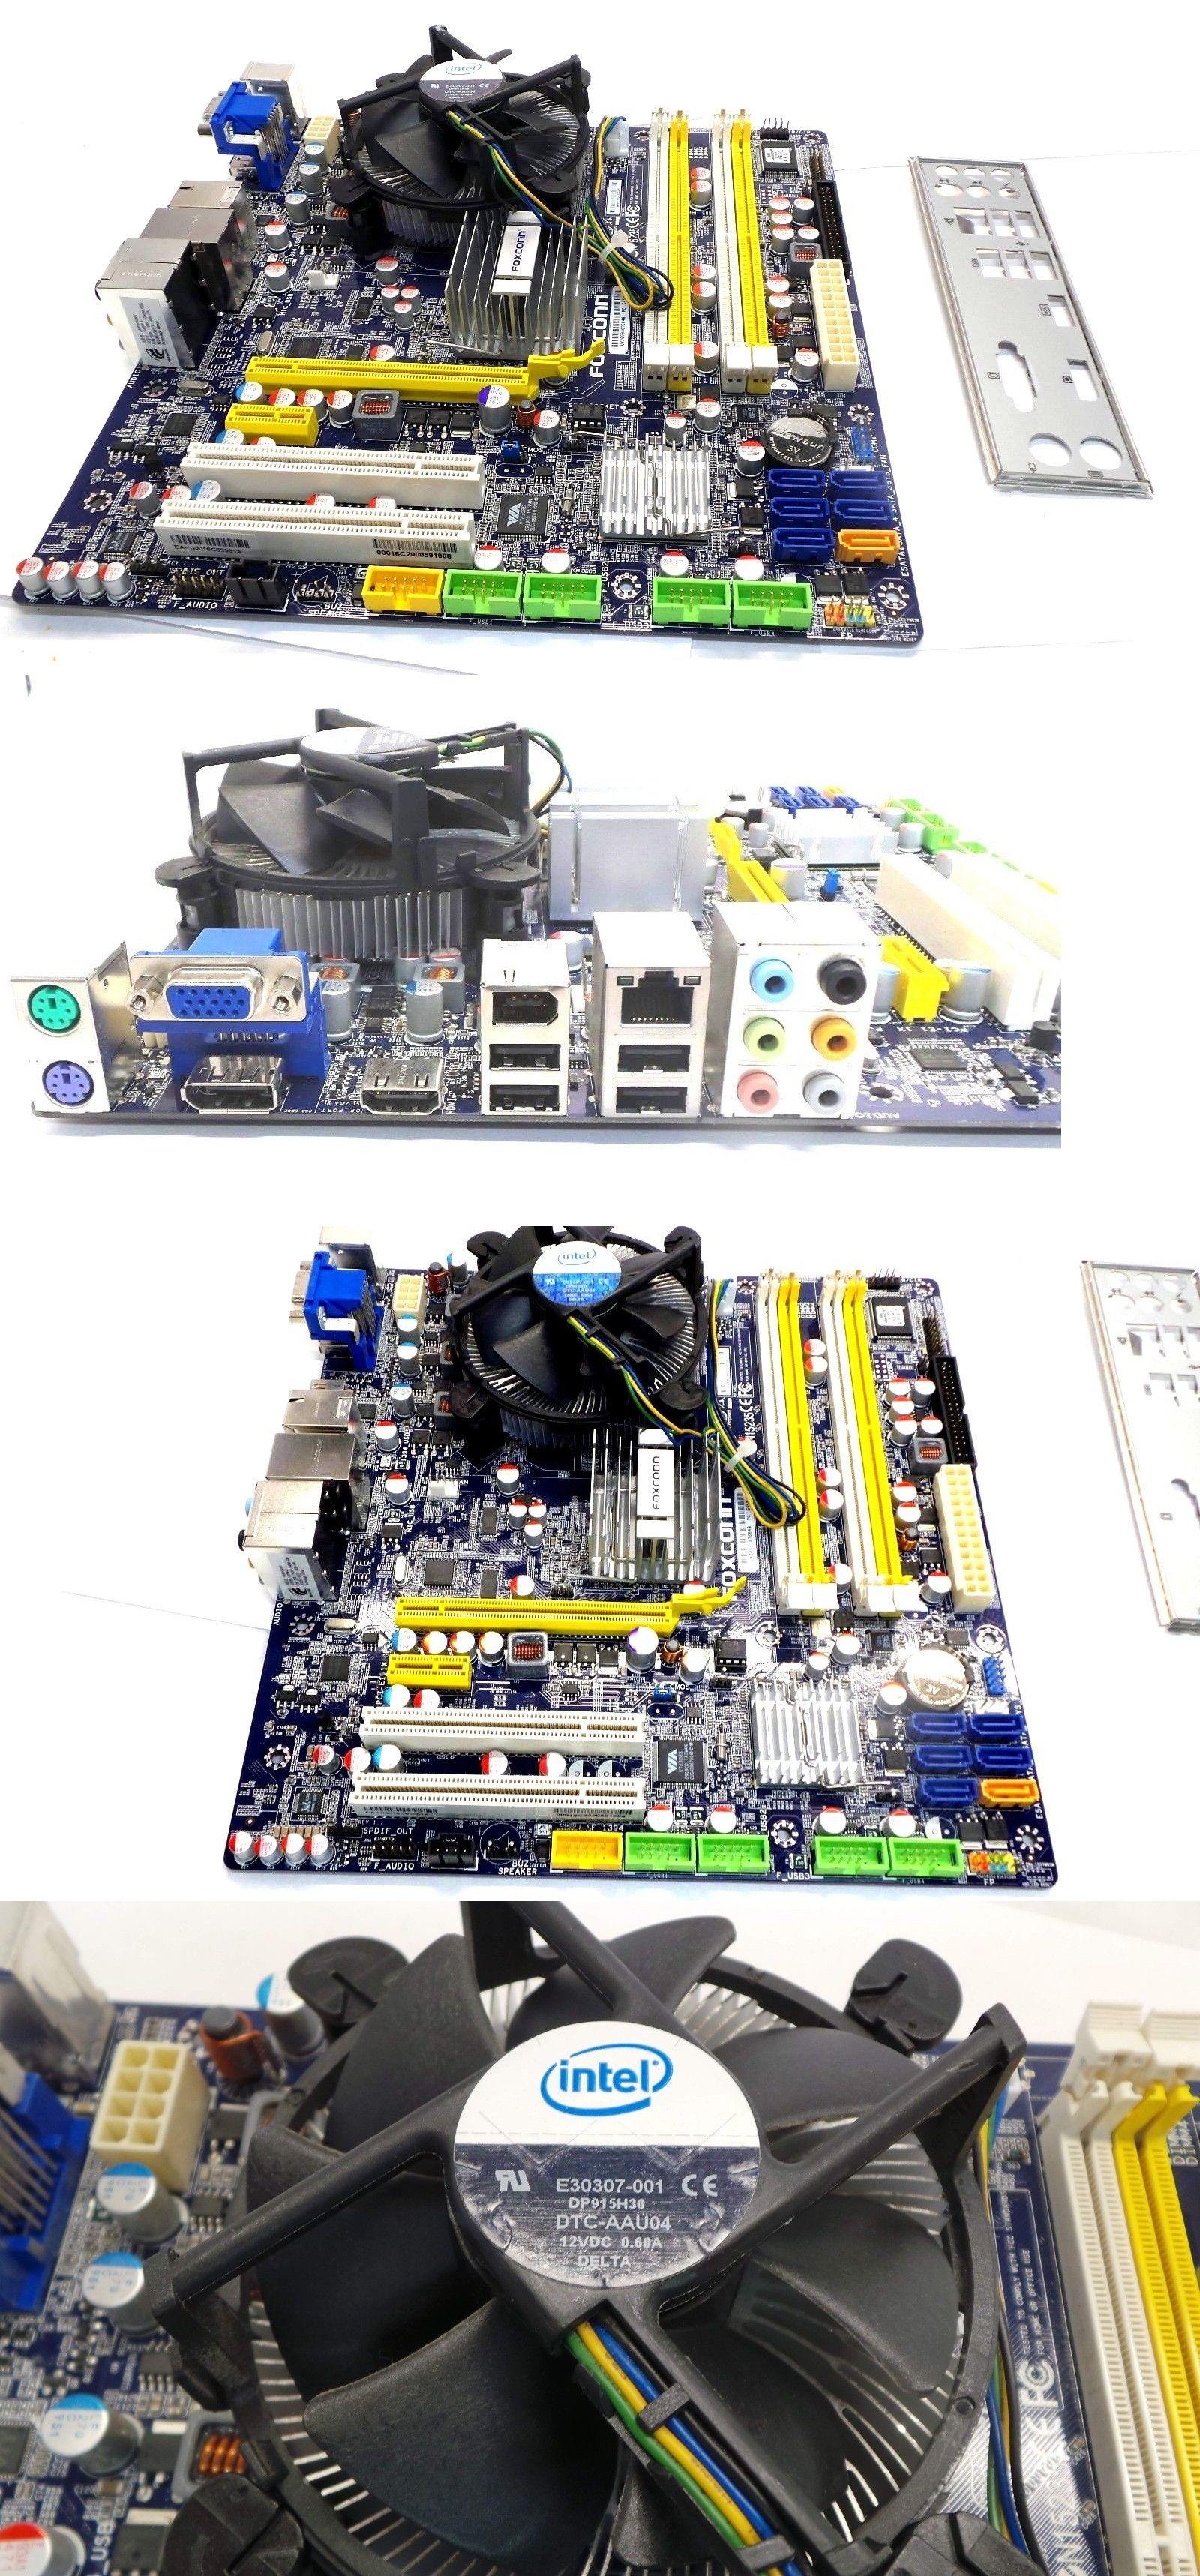 N15235 MOTHERBOARD NETWORK WINDOWS 7 64BIT DRIVER